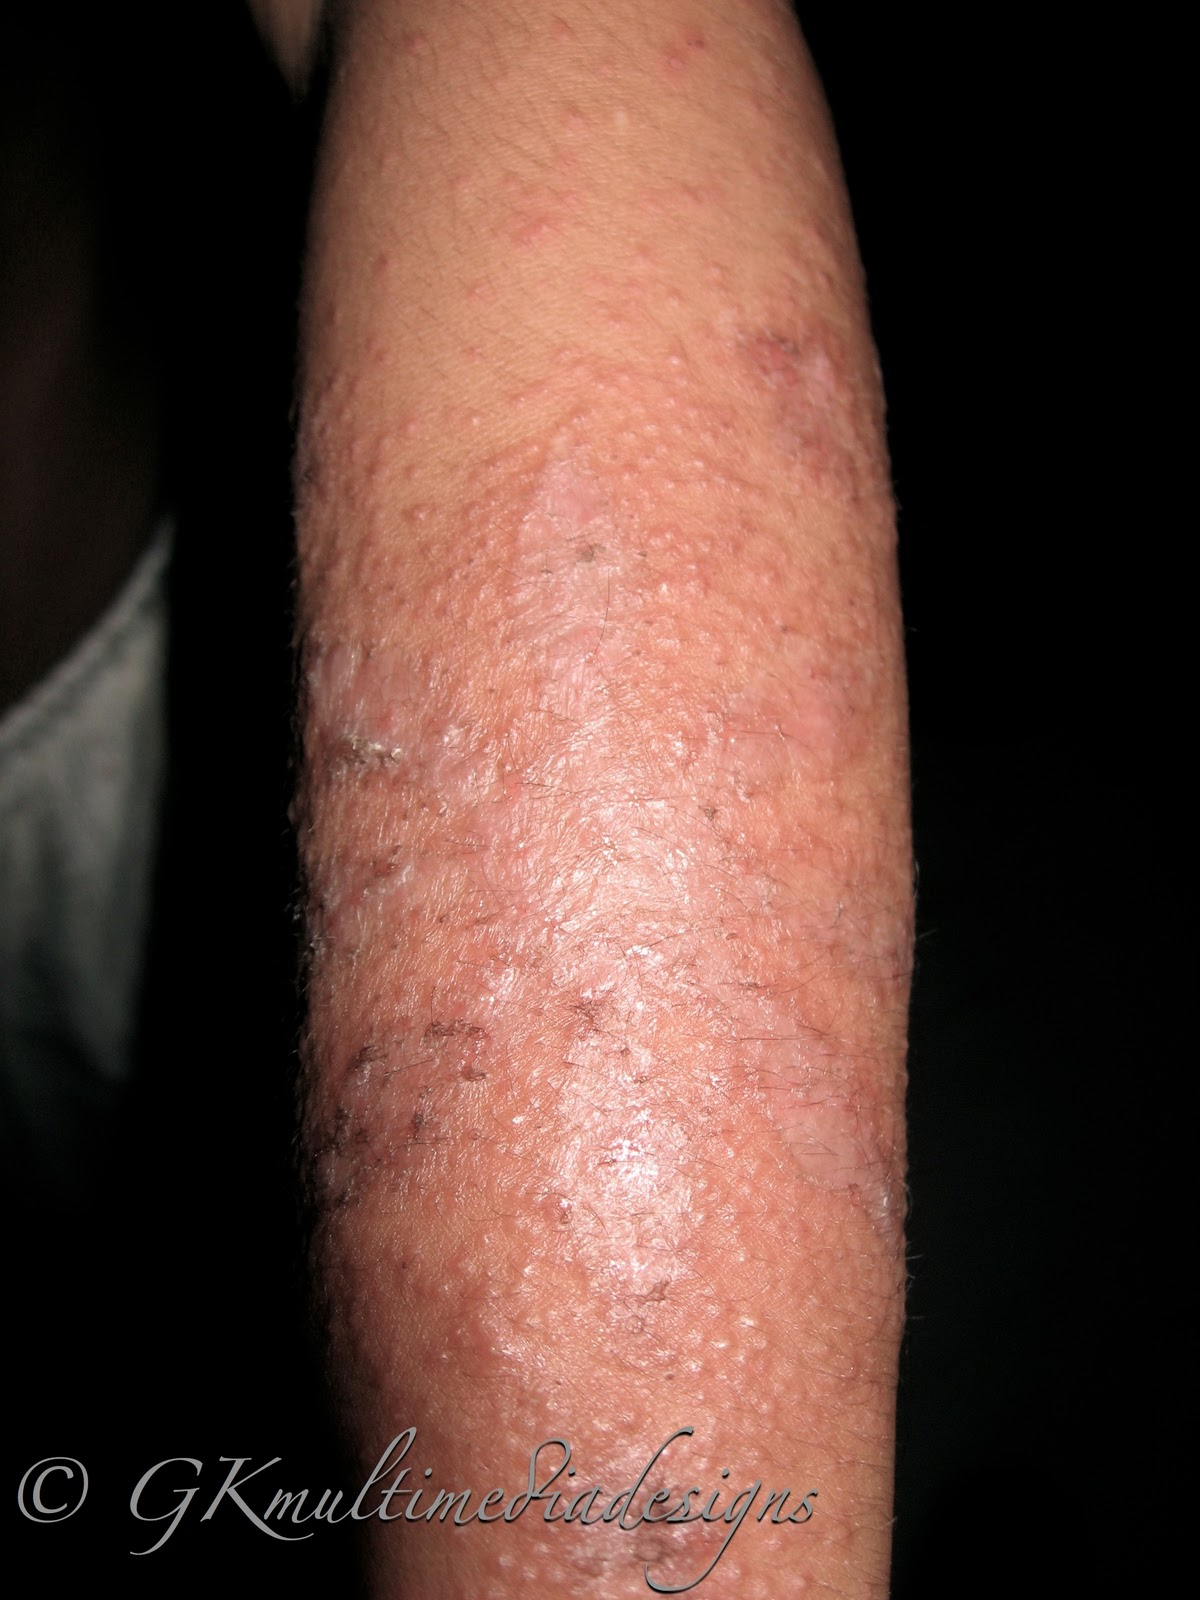 Henna Tattoo Allergy Symptoms: Anything Under The Sun: Beware Of Henna Tattoo Allergy